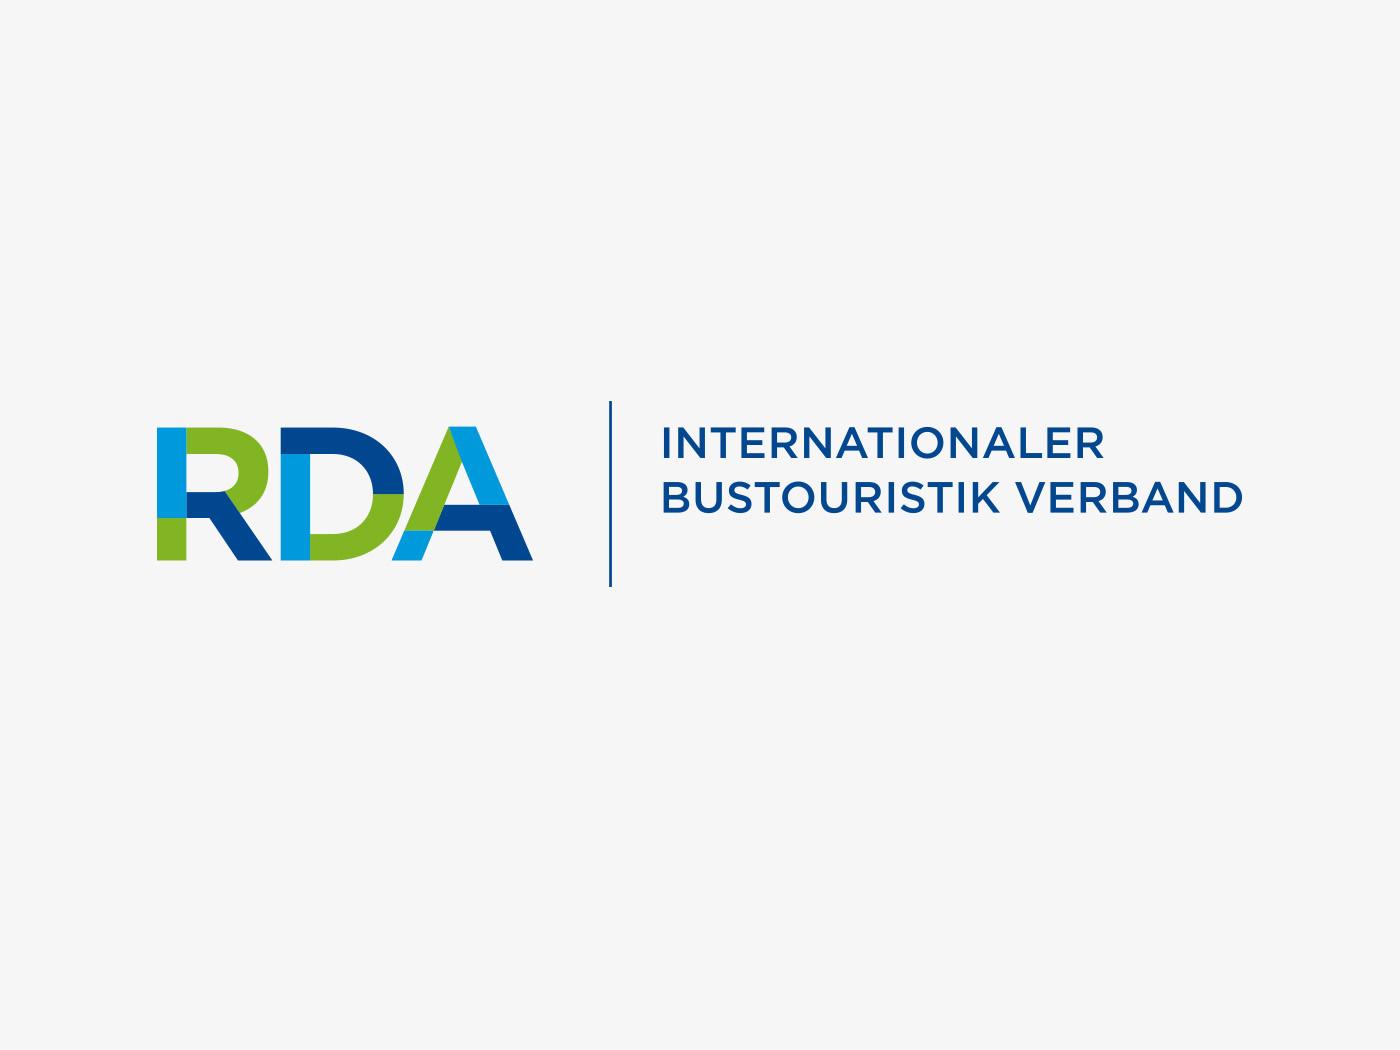 logoentwicklung-rda-verband